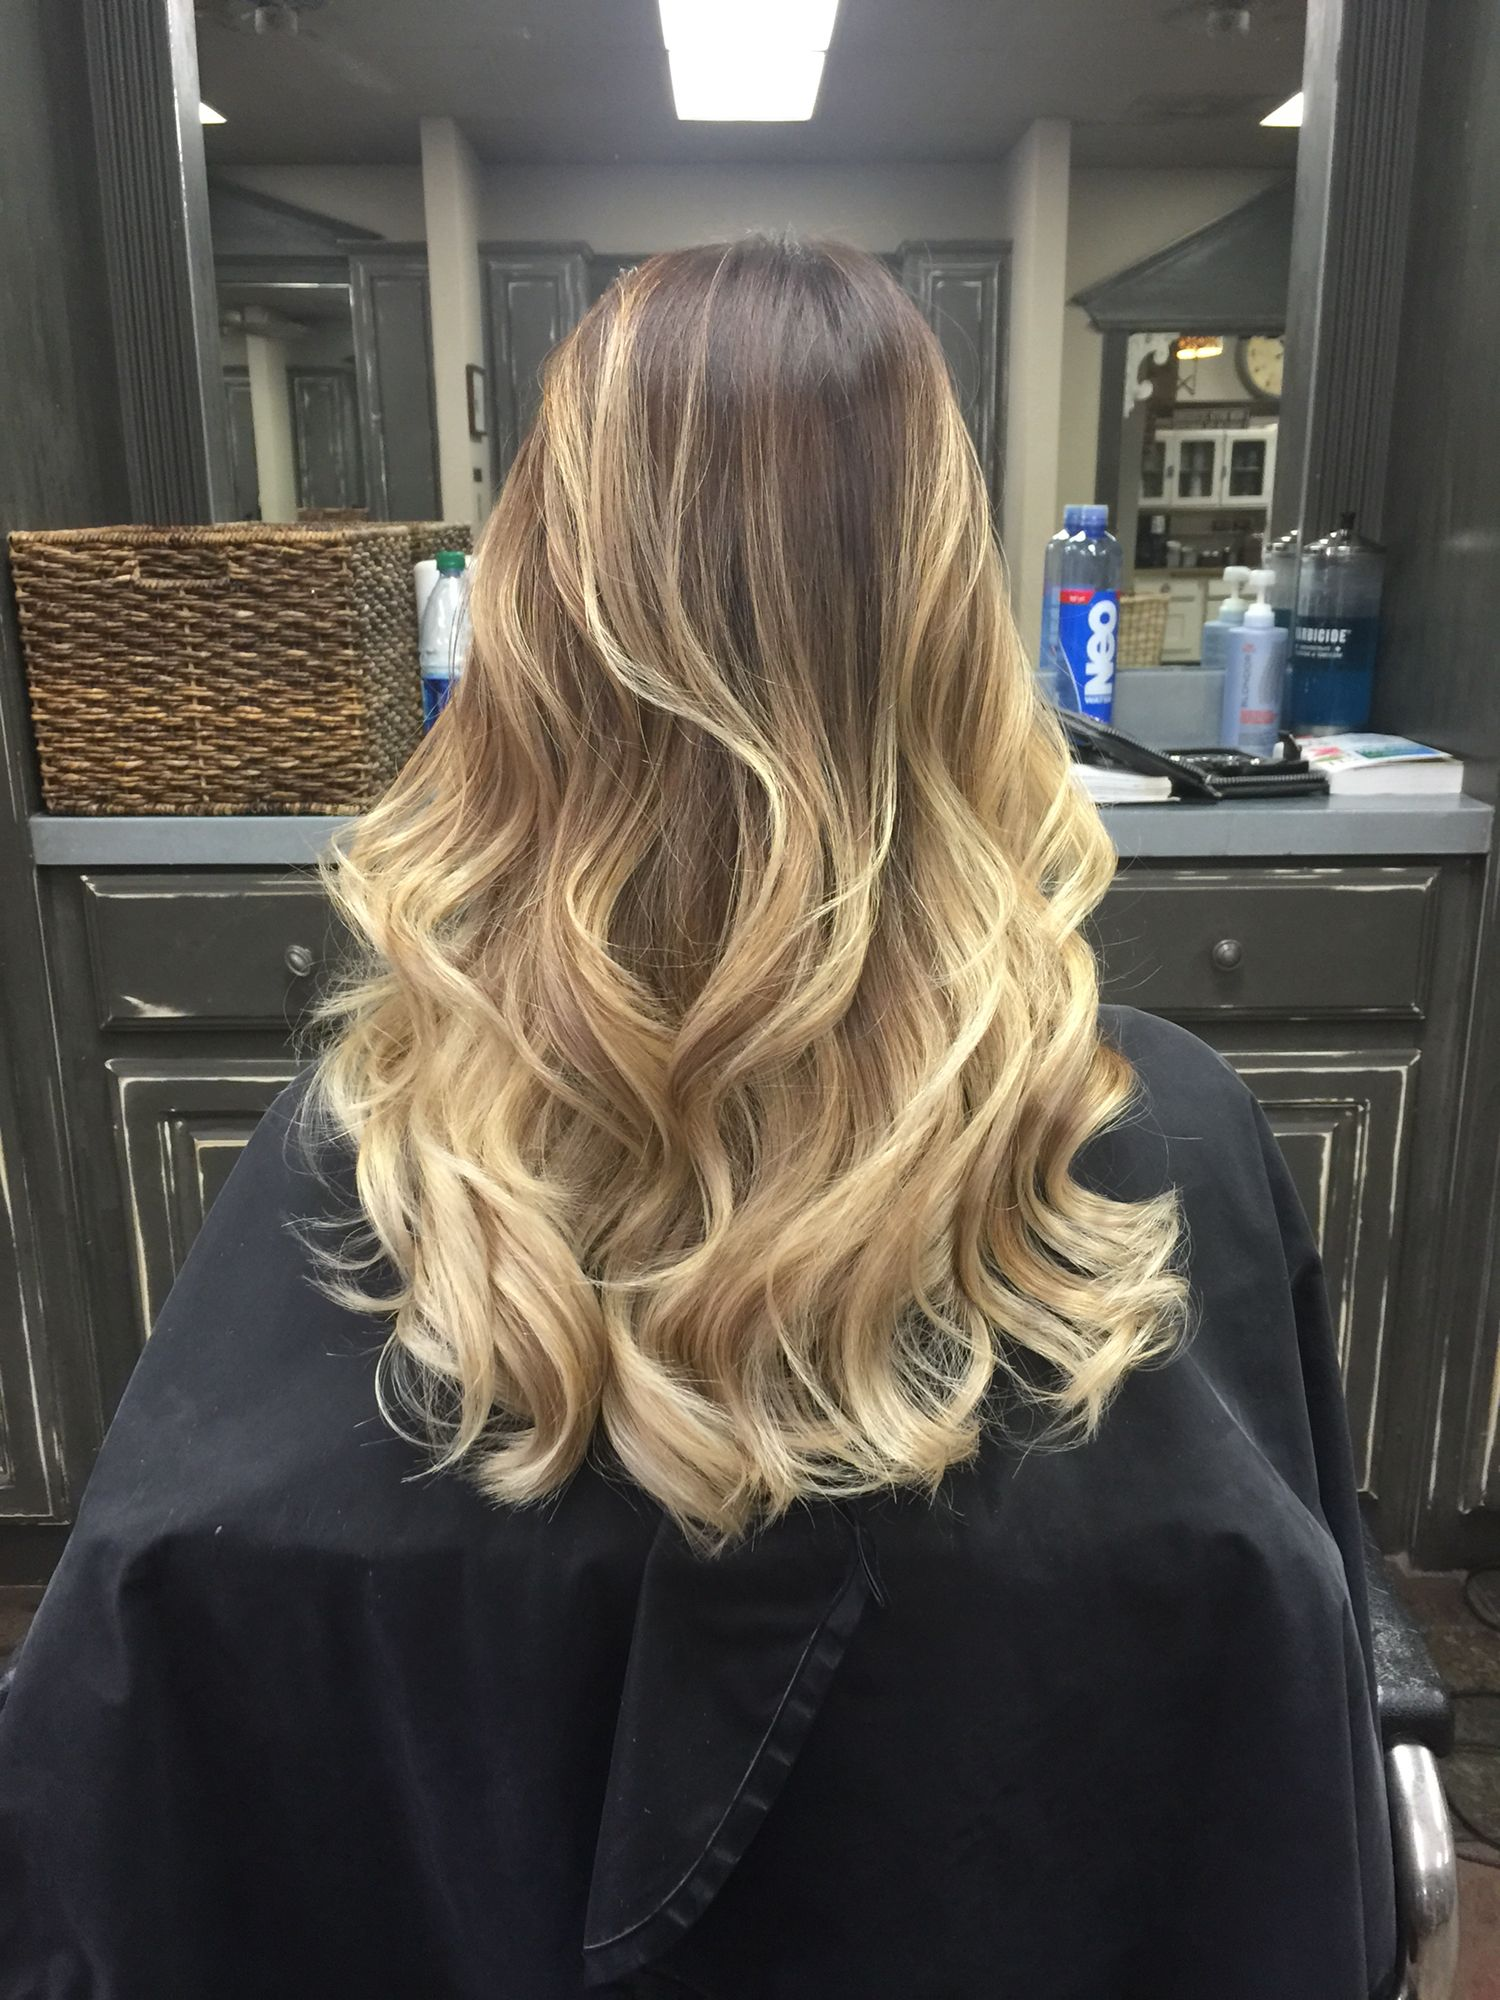 Pin by esi braimah on hair in pinterest hair hair inspo